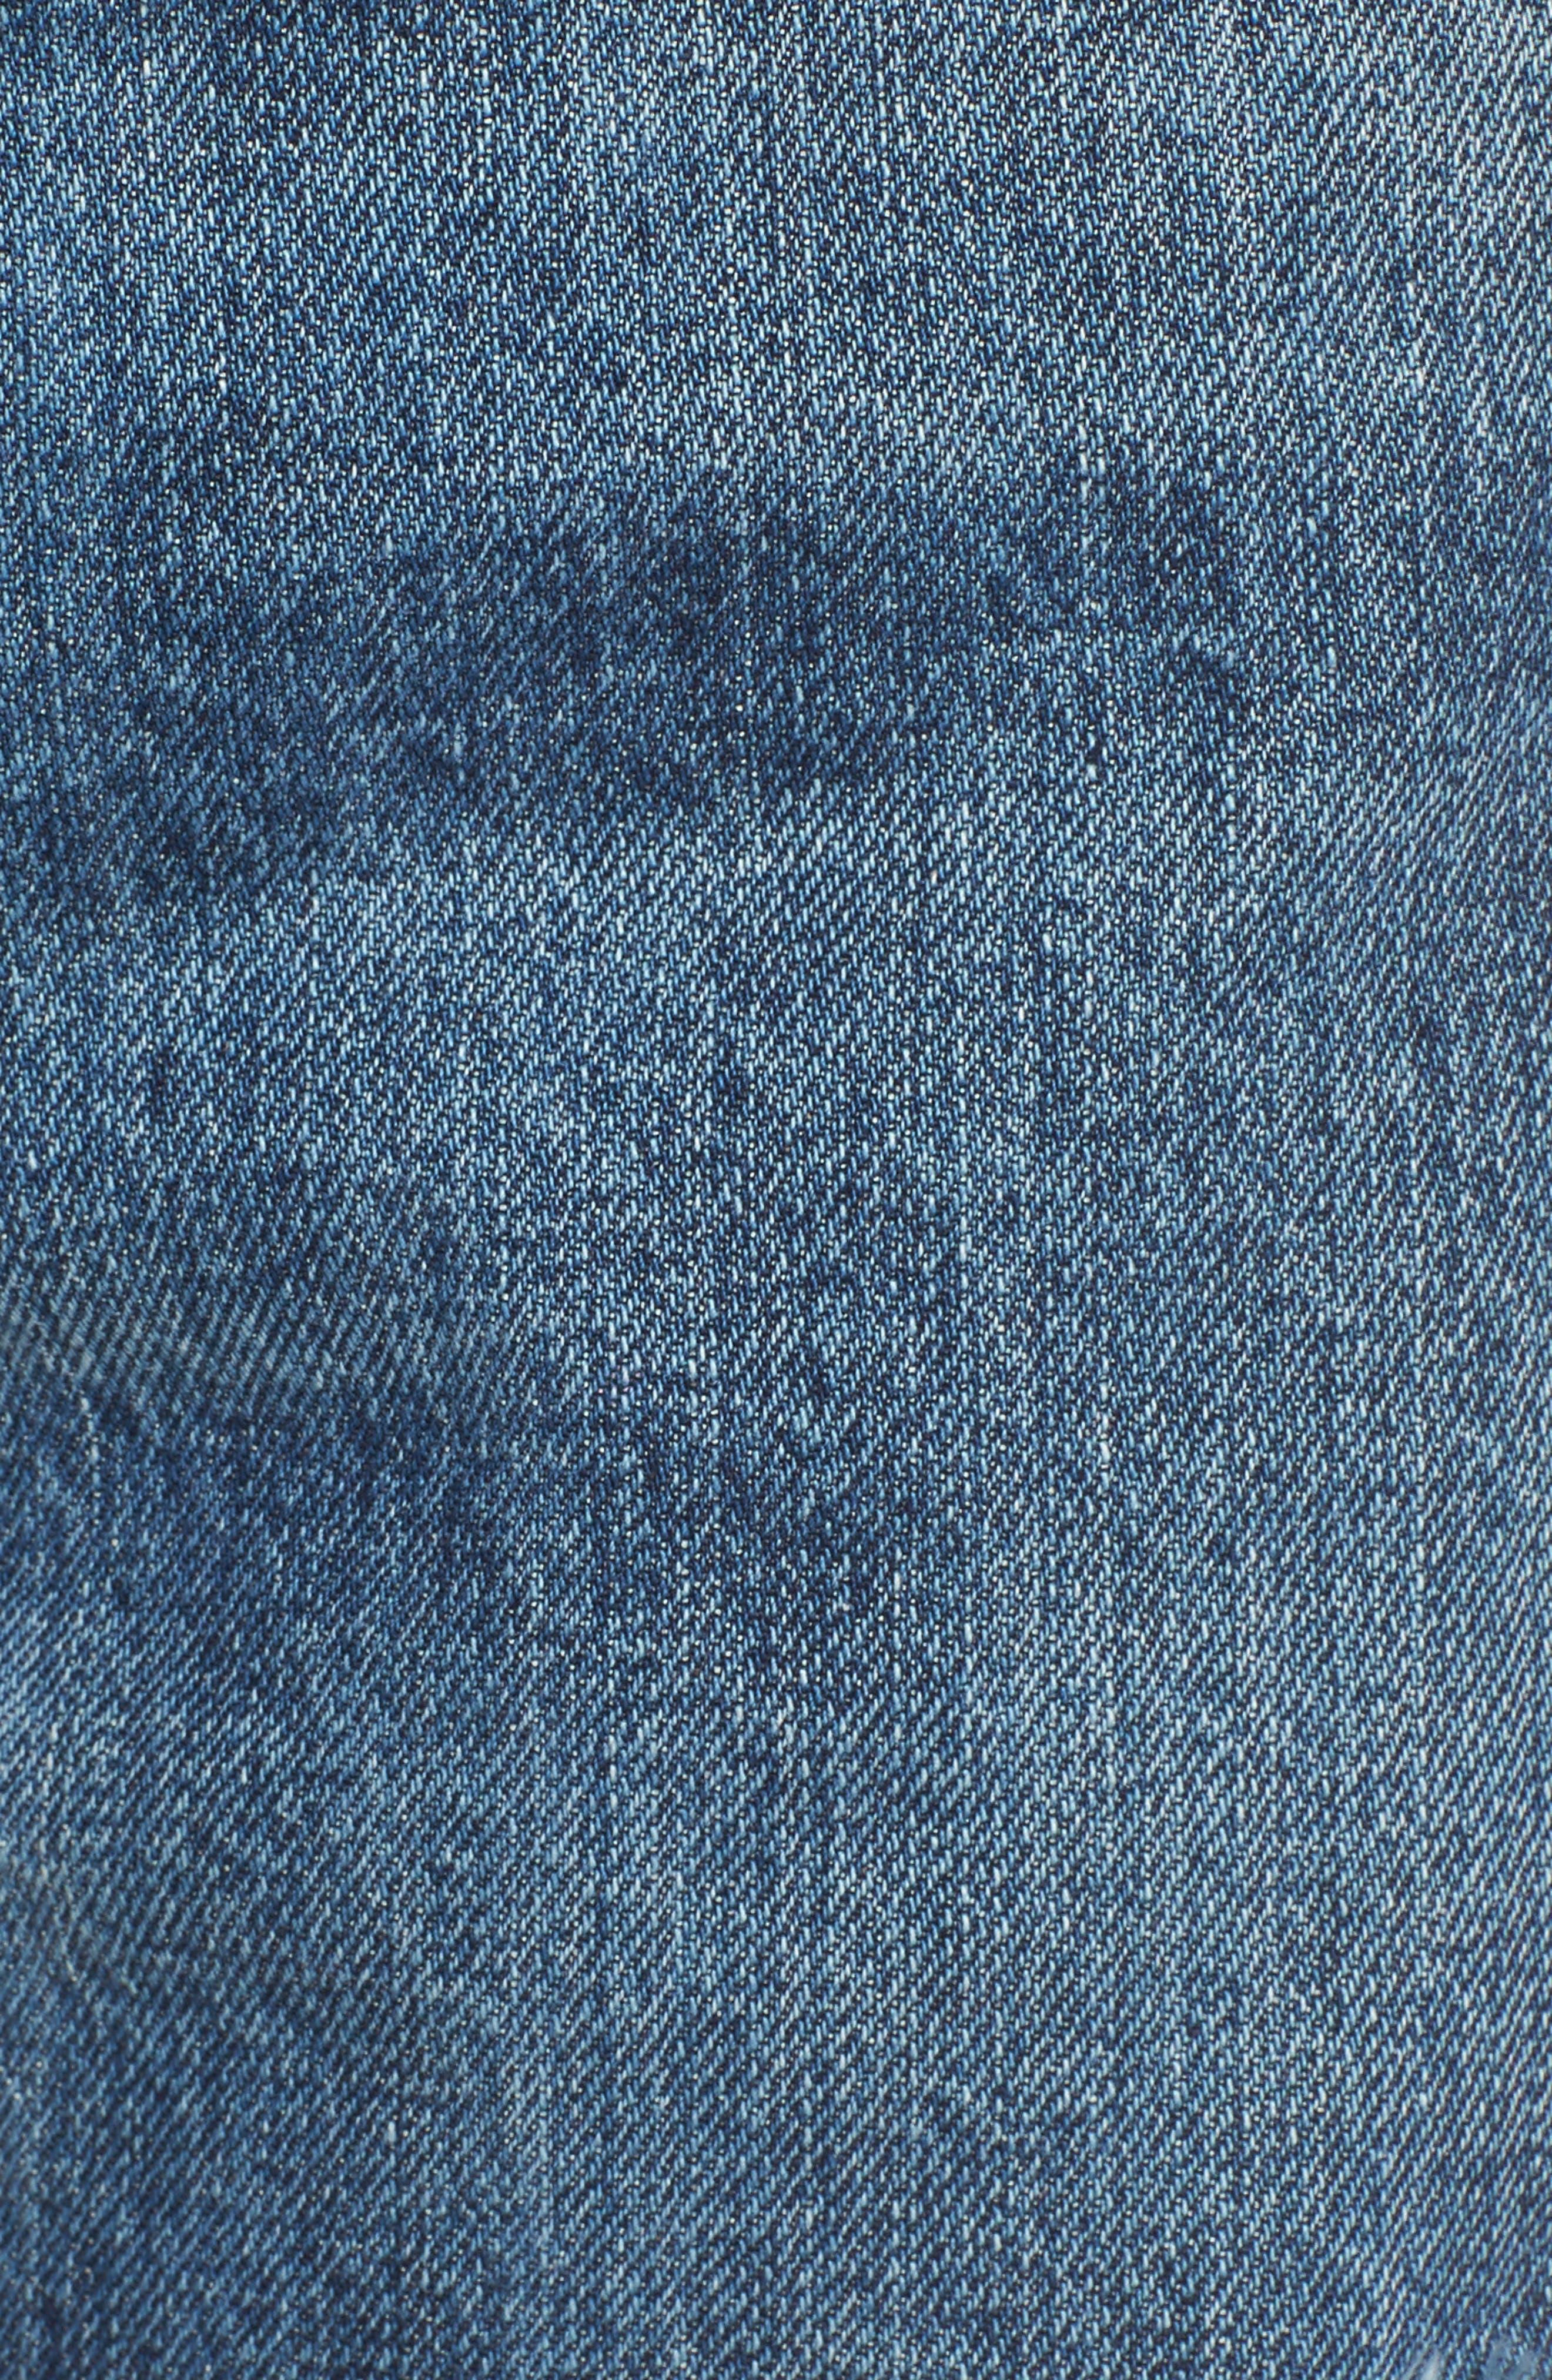 Lou High Waist Cutoff Denim Shorts,                             Alternate thumbnail 5, color,                             400